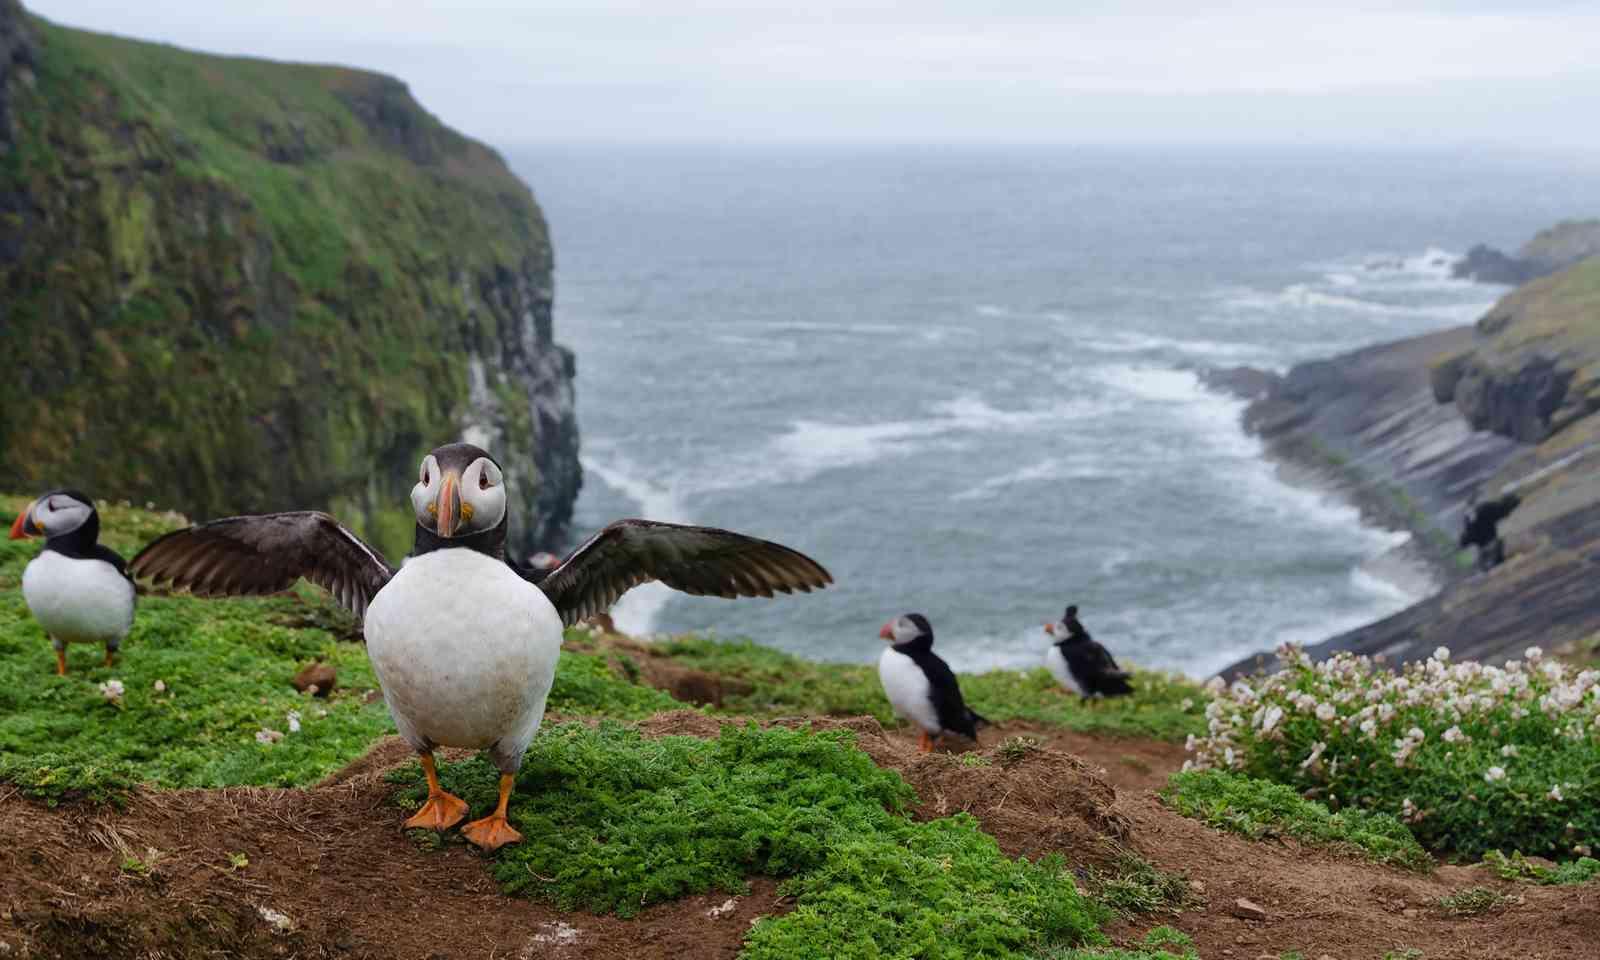 Puffins on Skomer Island (Shutterstock.com)